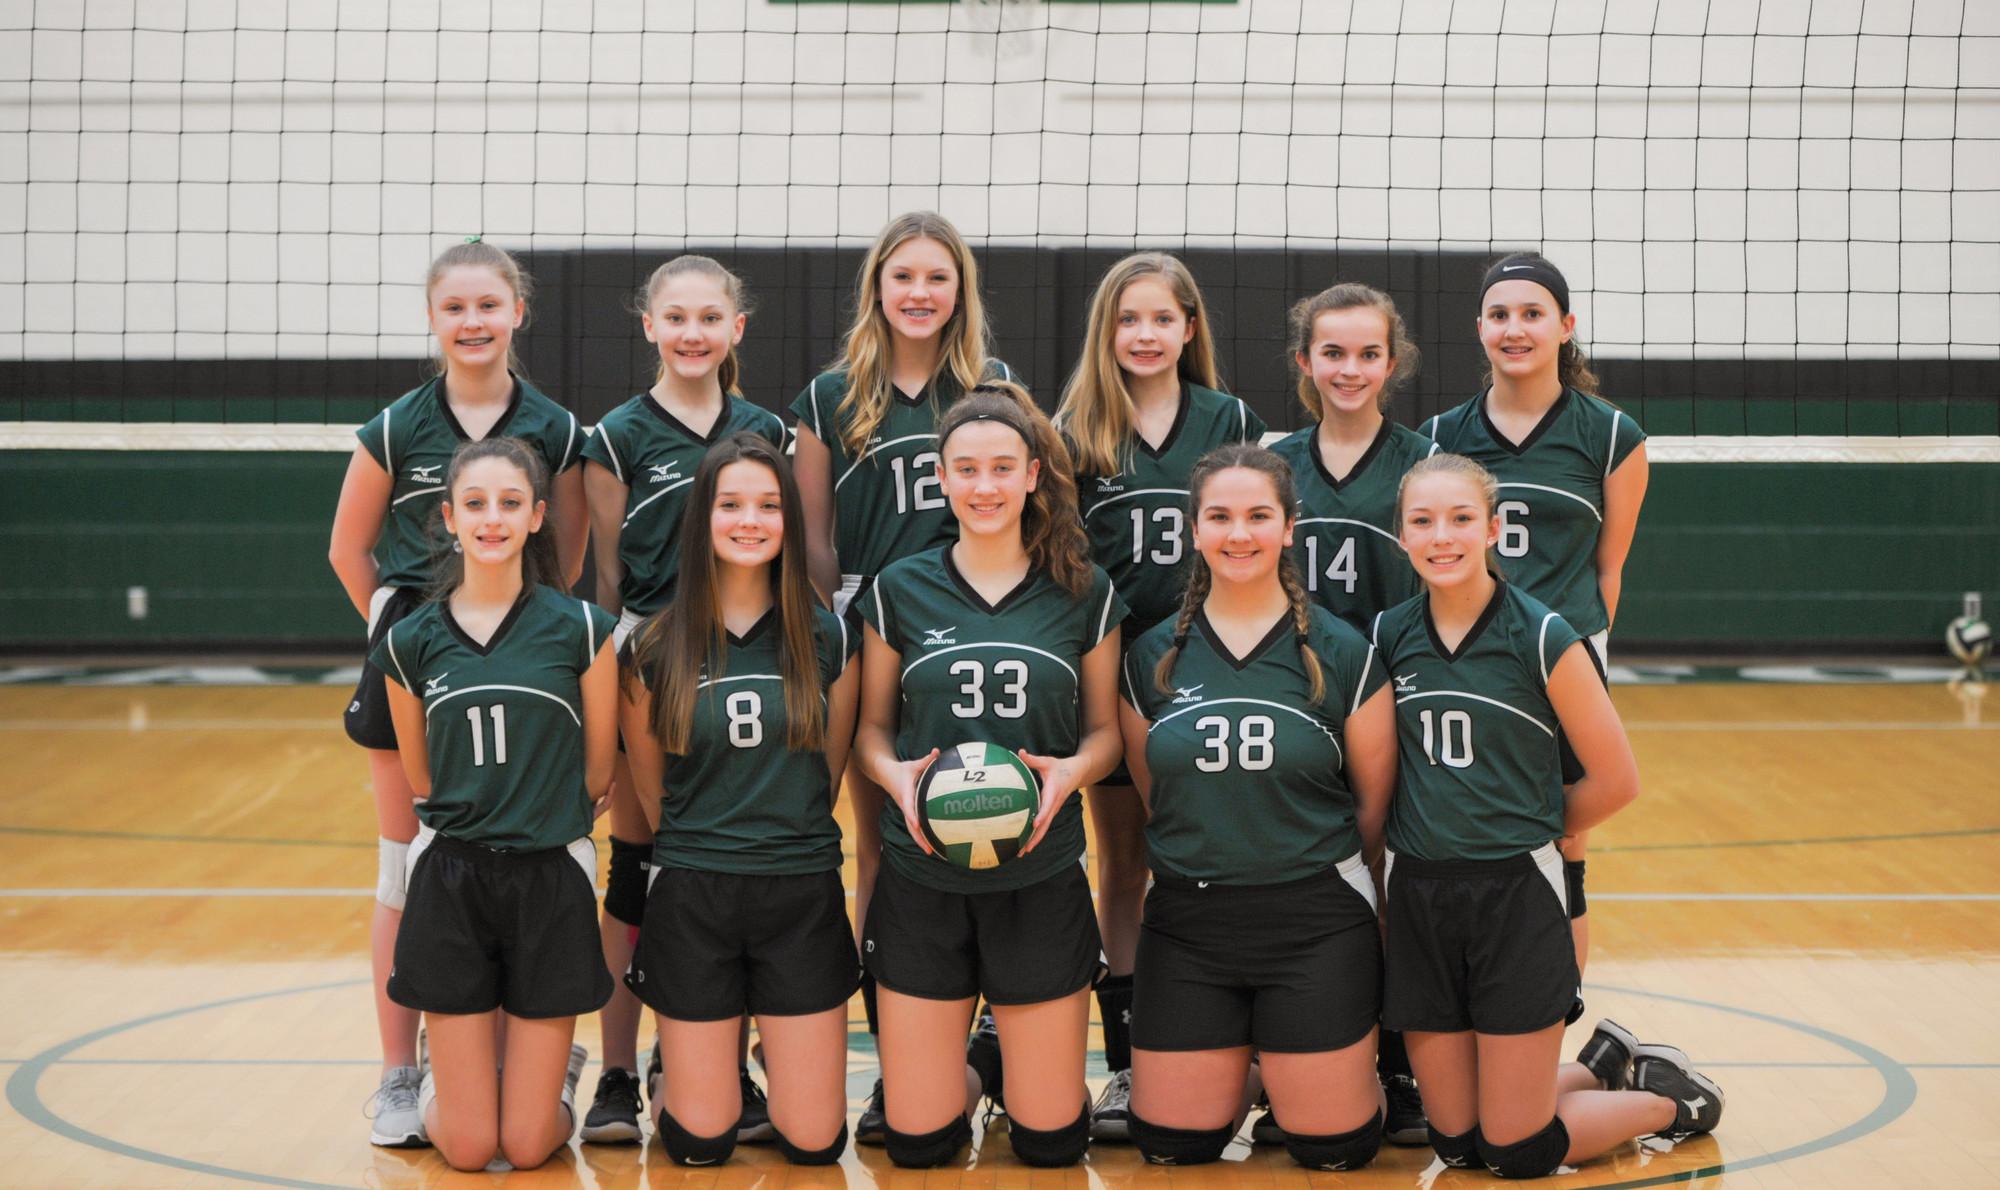 Volleyball 8th Grade Team